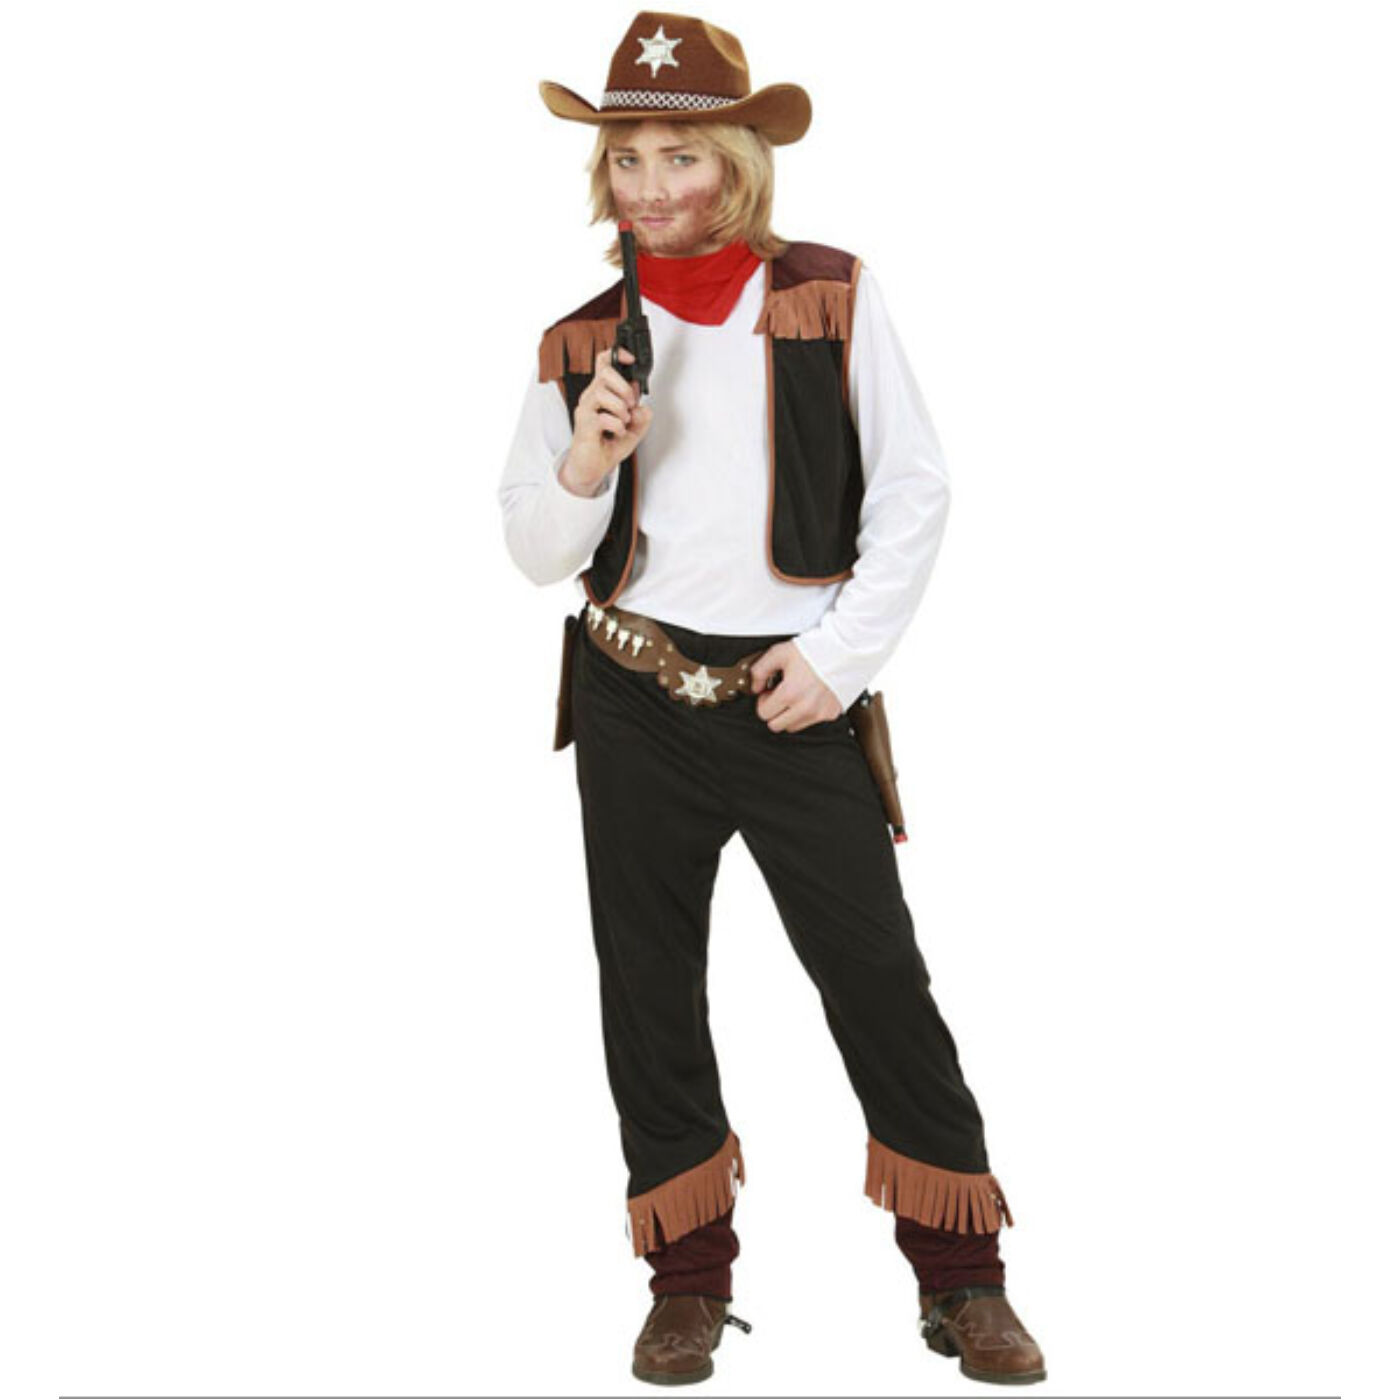 Cowboy jelmez 158-as